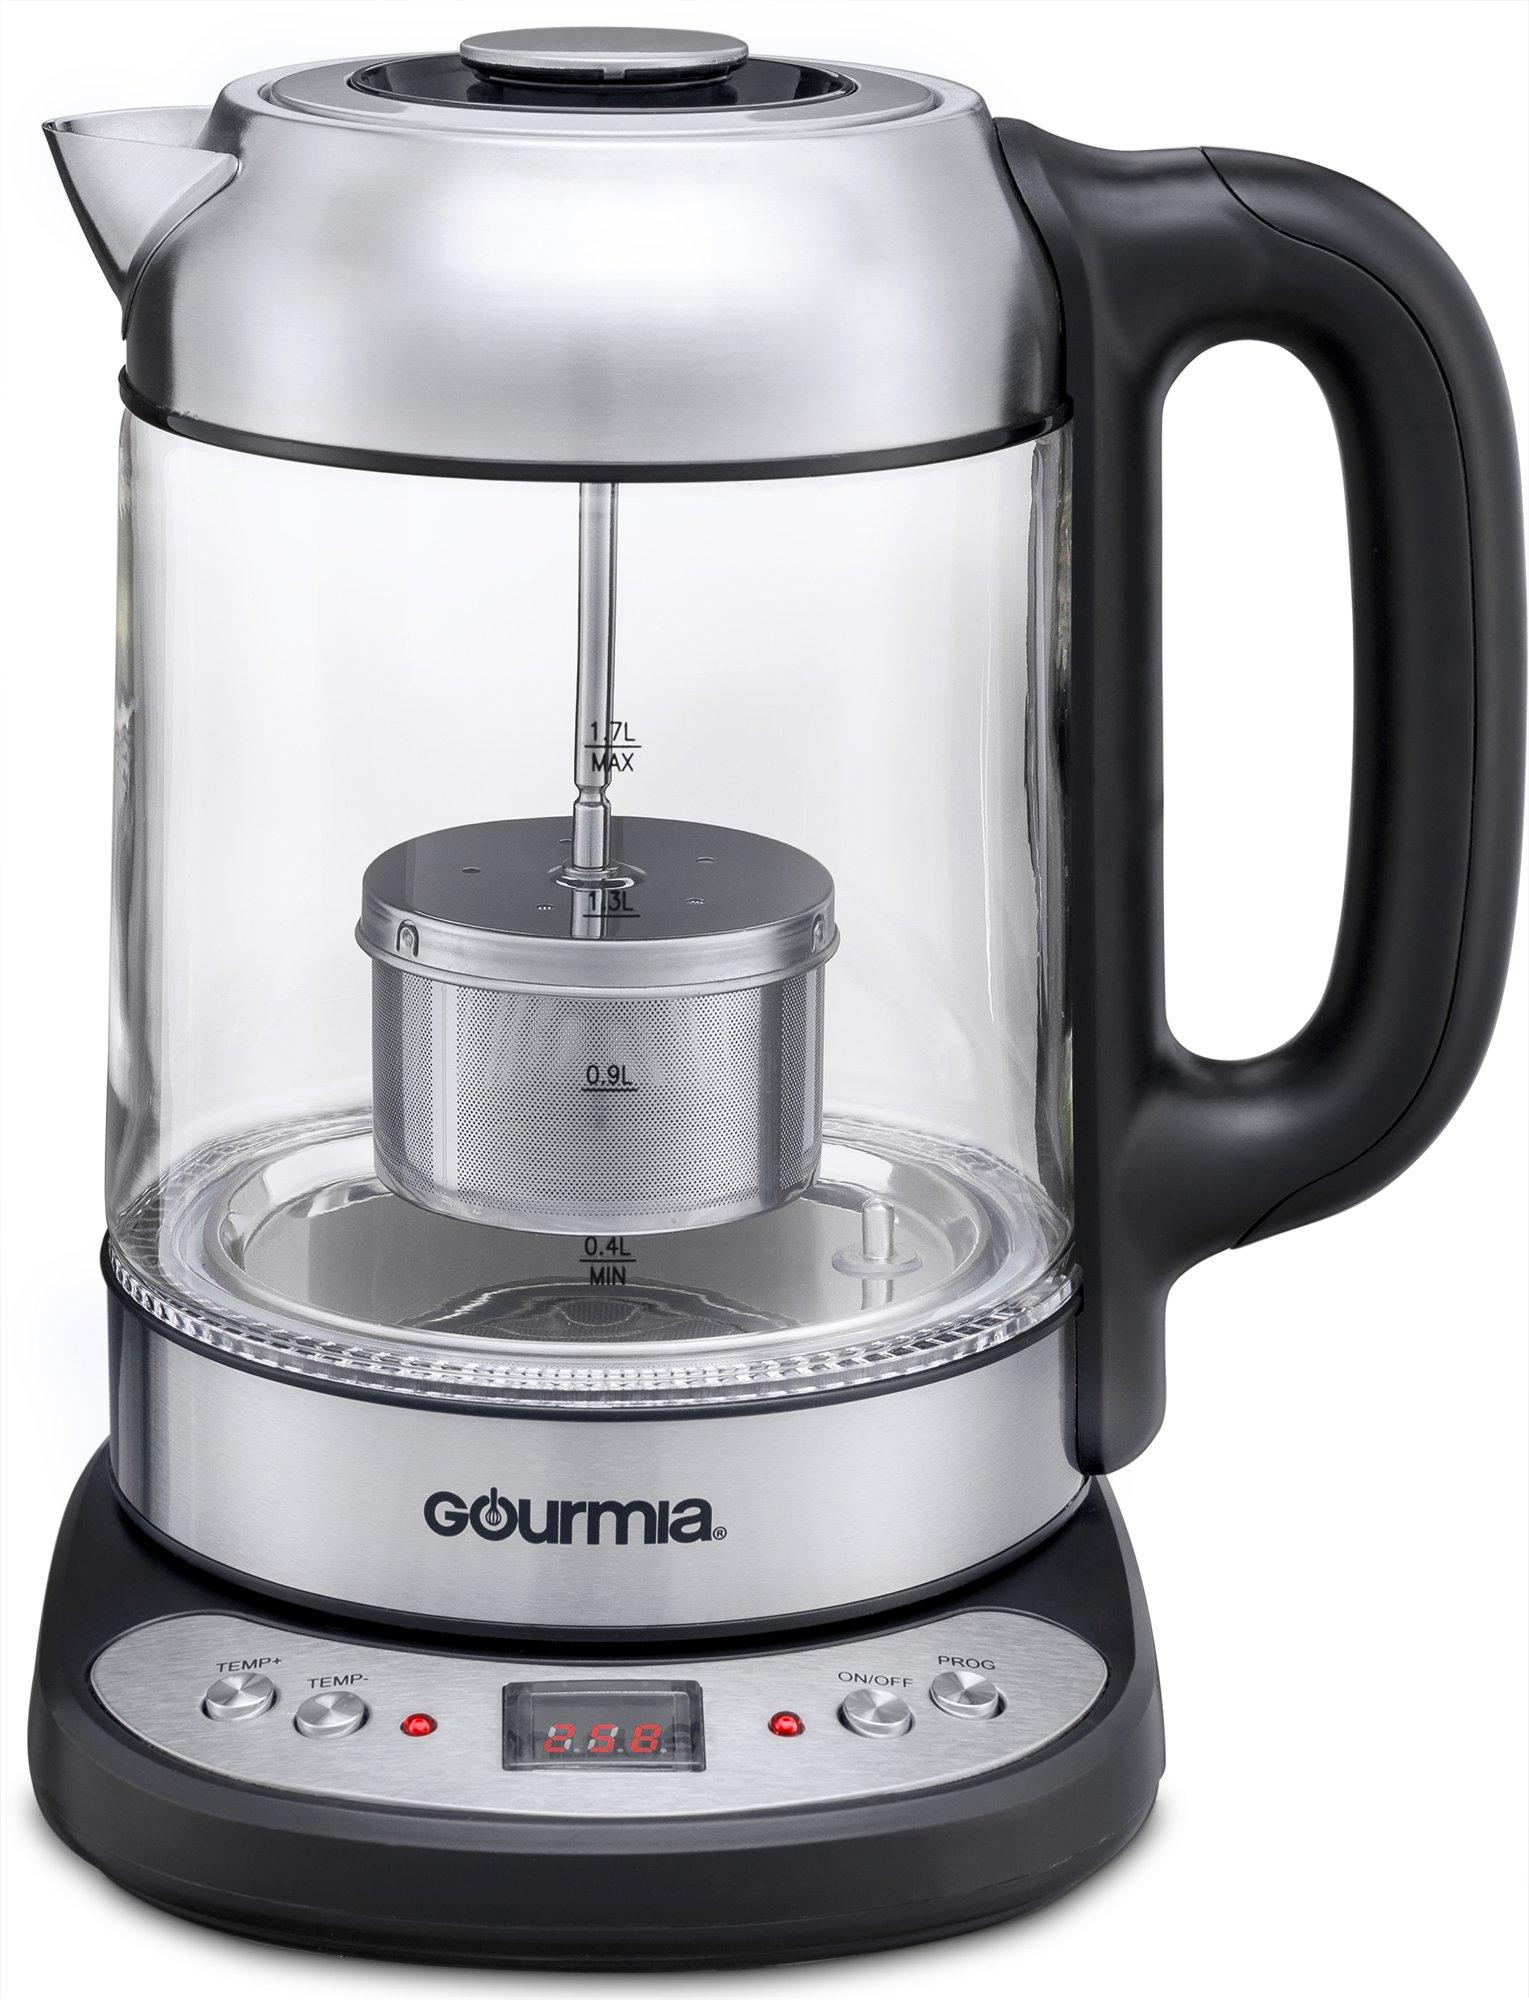 electric hot cold tea maker water boiler tea infuser teapots tea pot pots kettle 690001628633 ebay. Black Bedroom Furniture Sets. Home Design Ideas